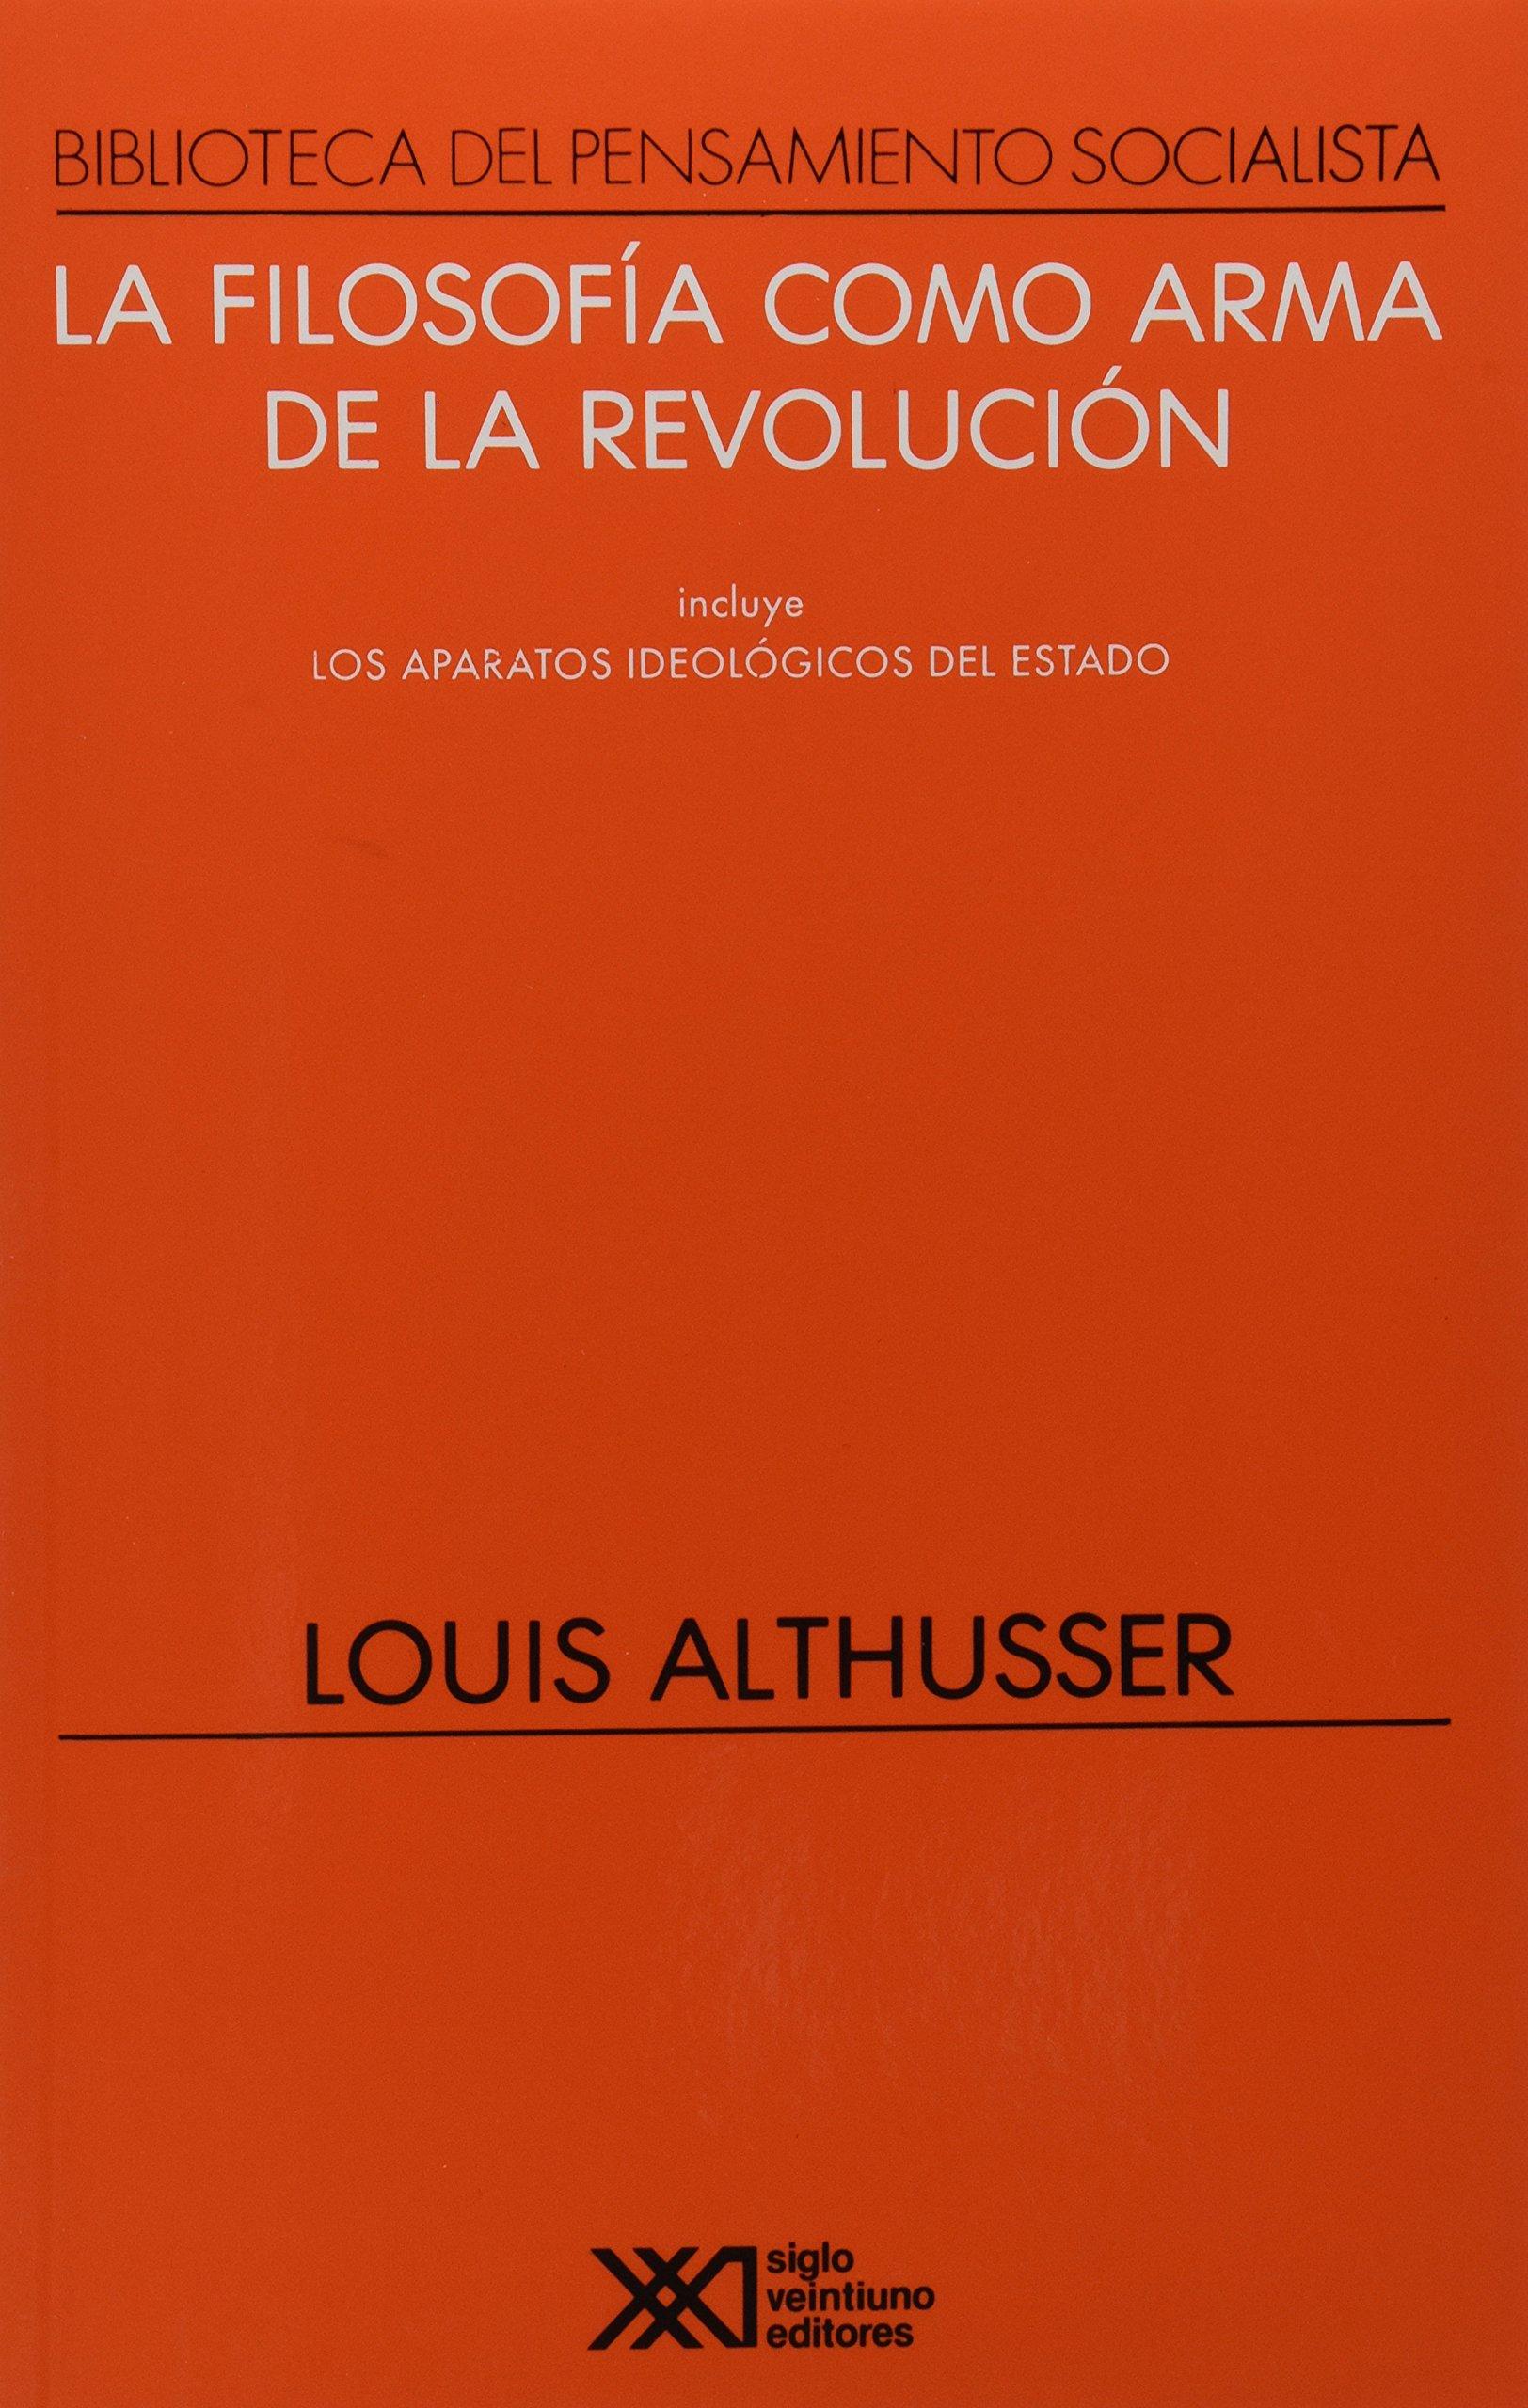 La filosofia como arma de la revolucion (Spanish Edition): Louis Althusser:  9789682315473: Amazon.com: Books